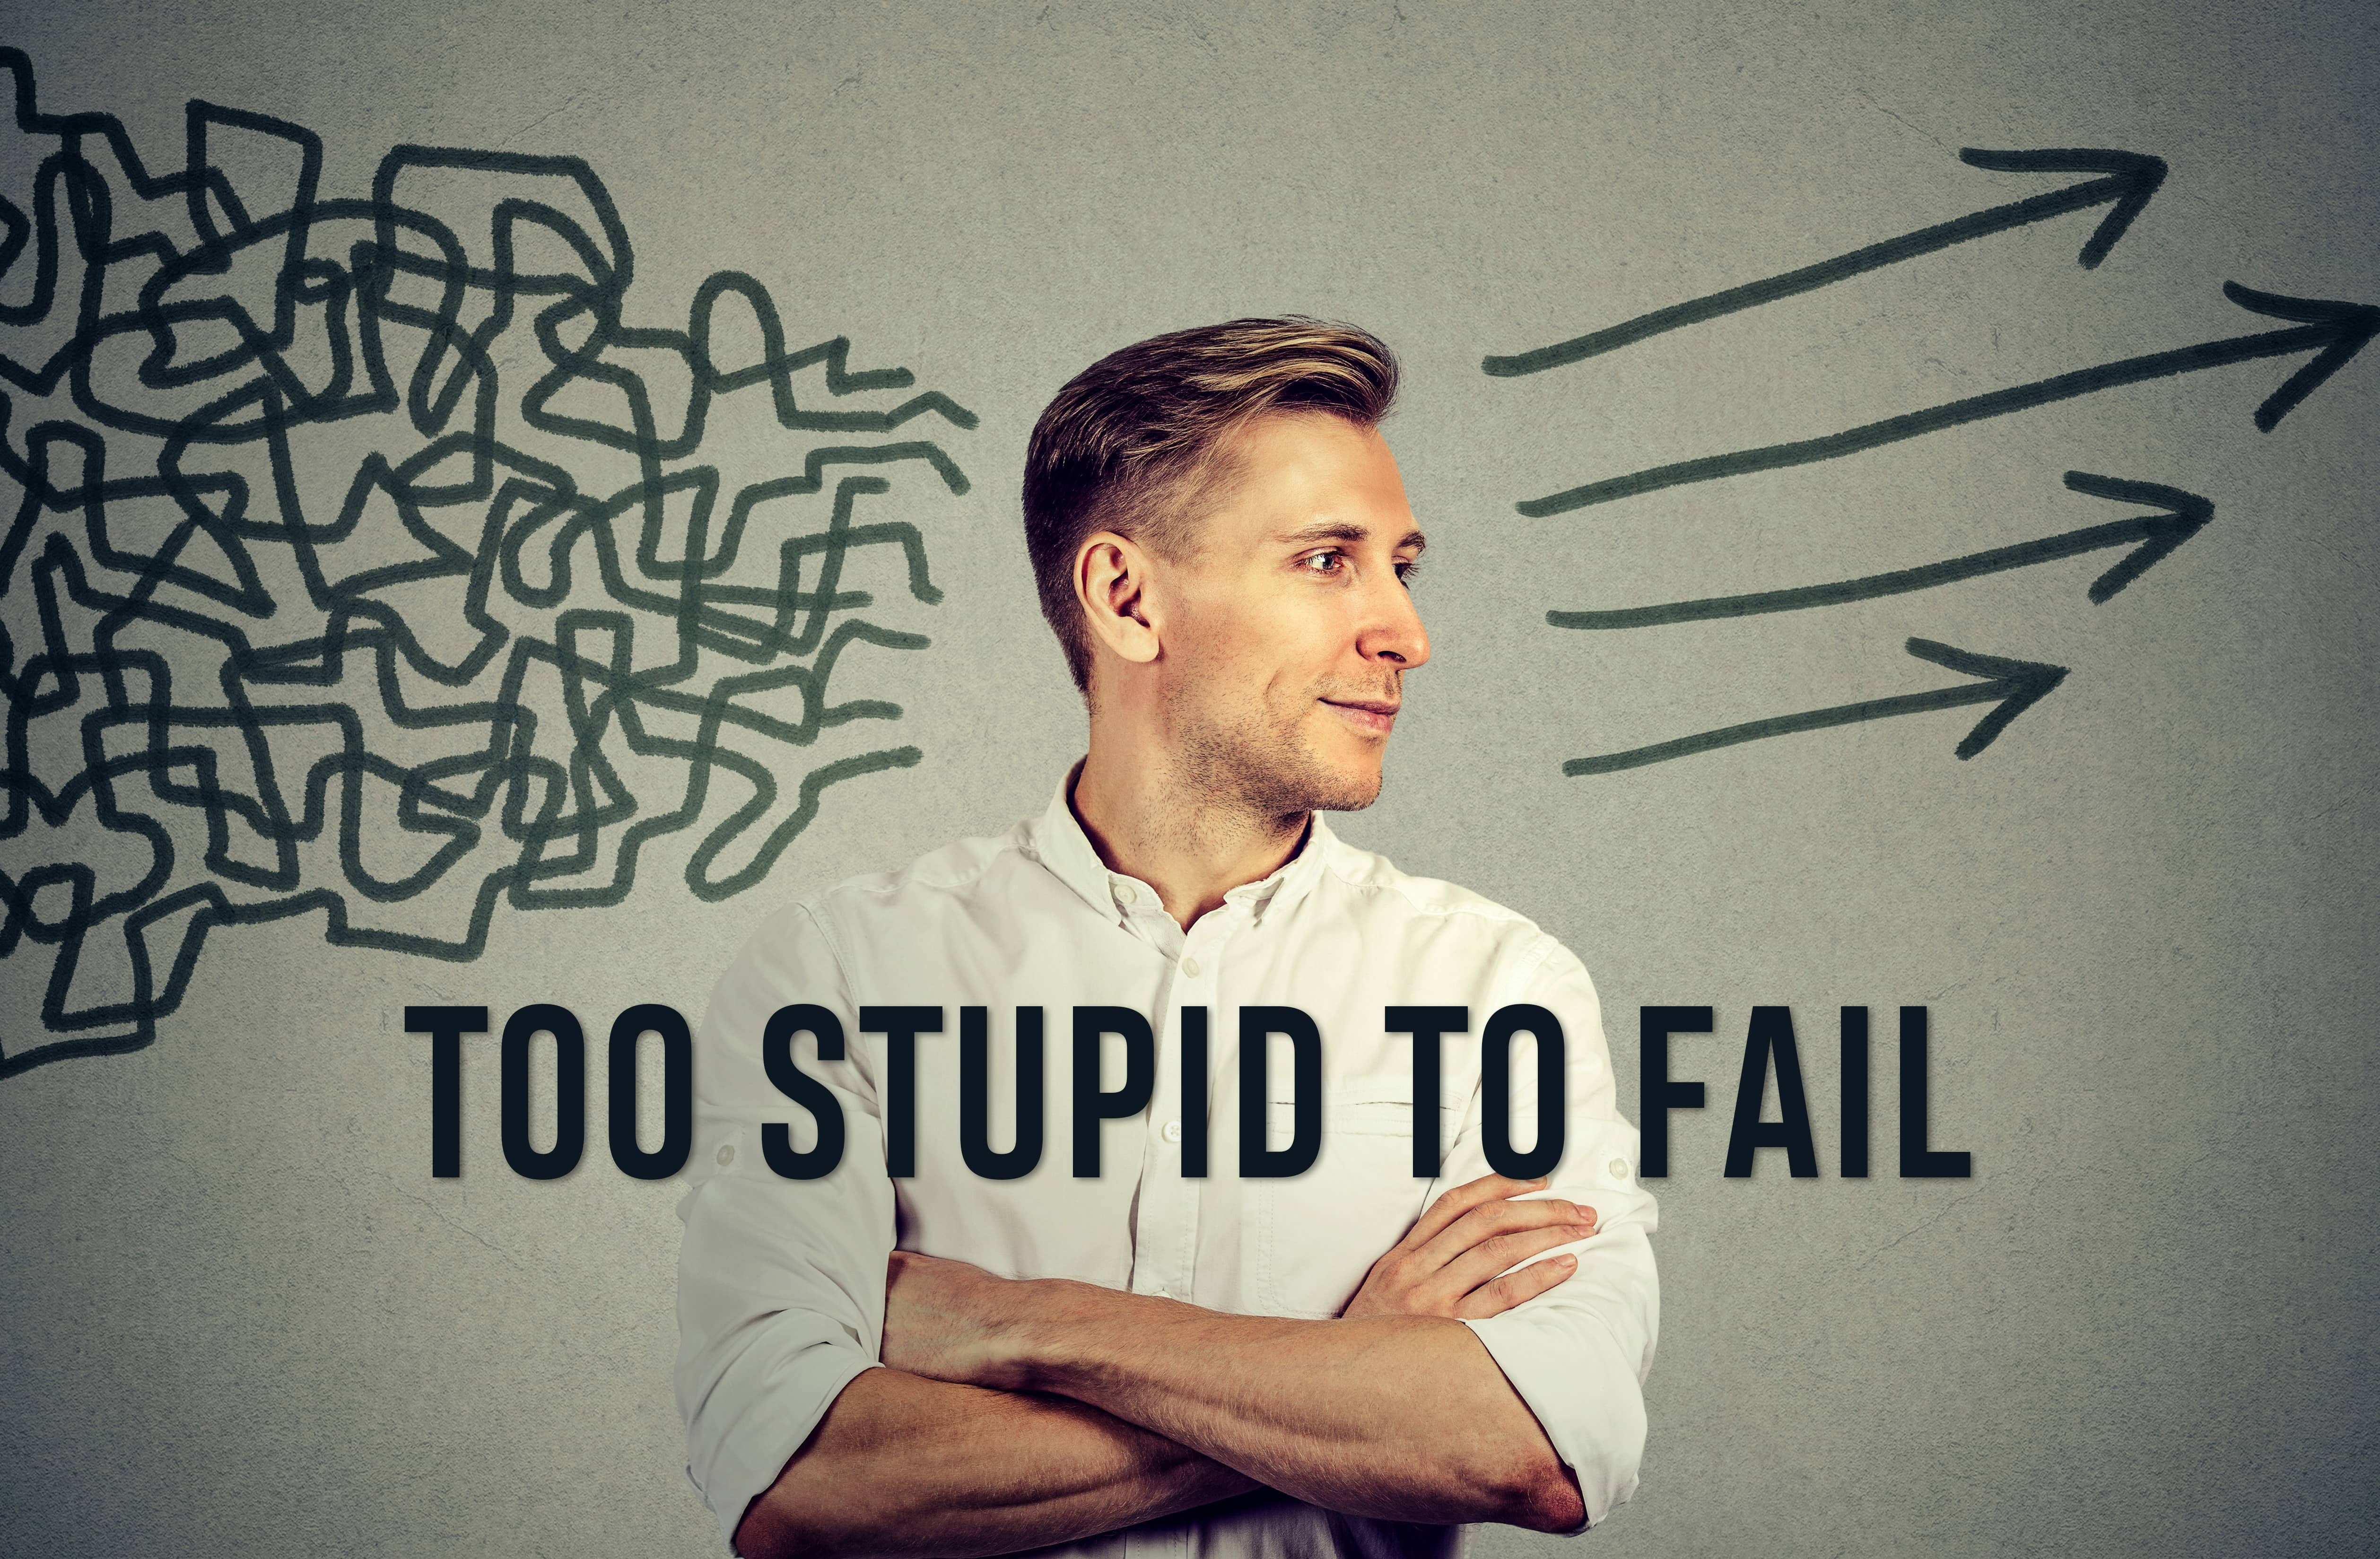 TOO STUPID TO FAIL